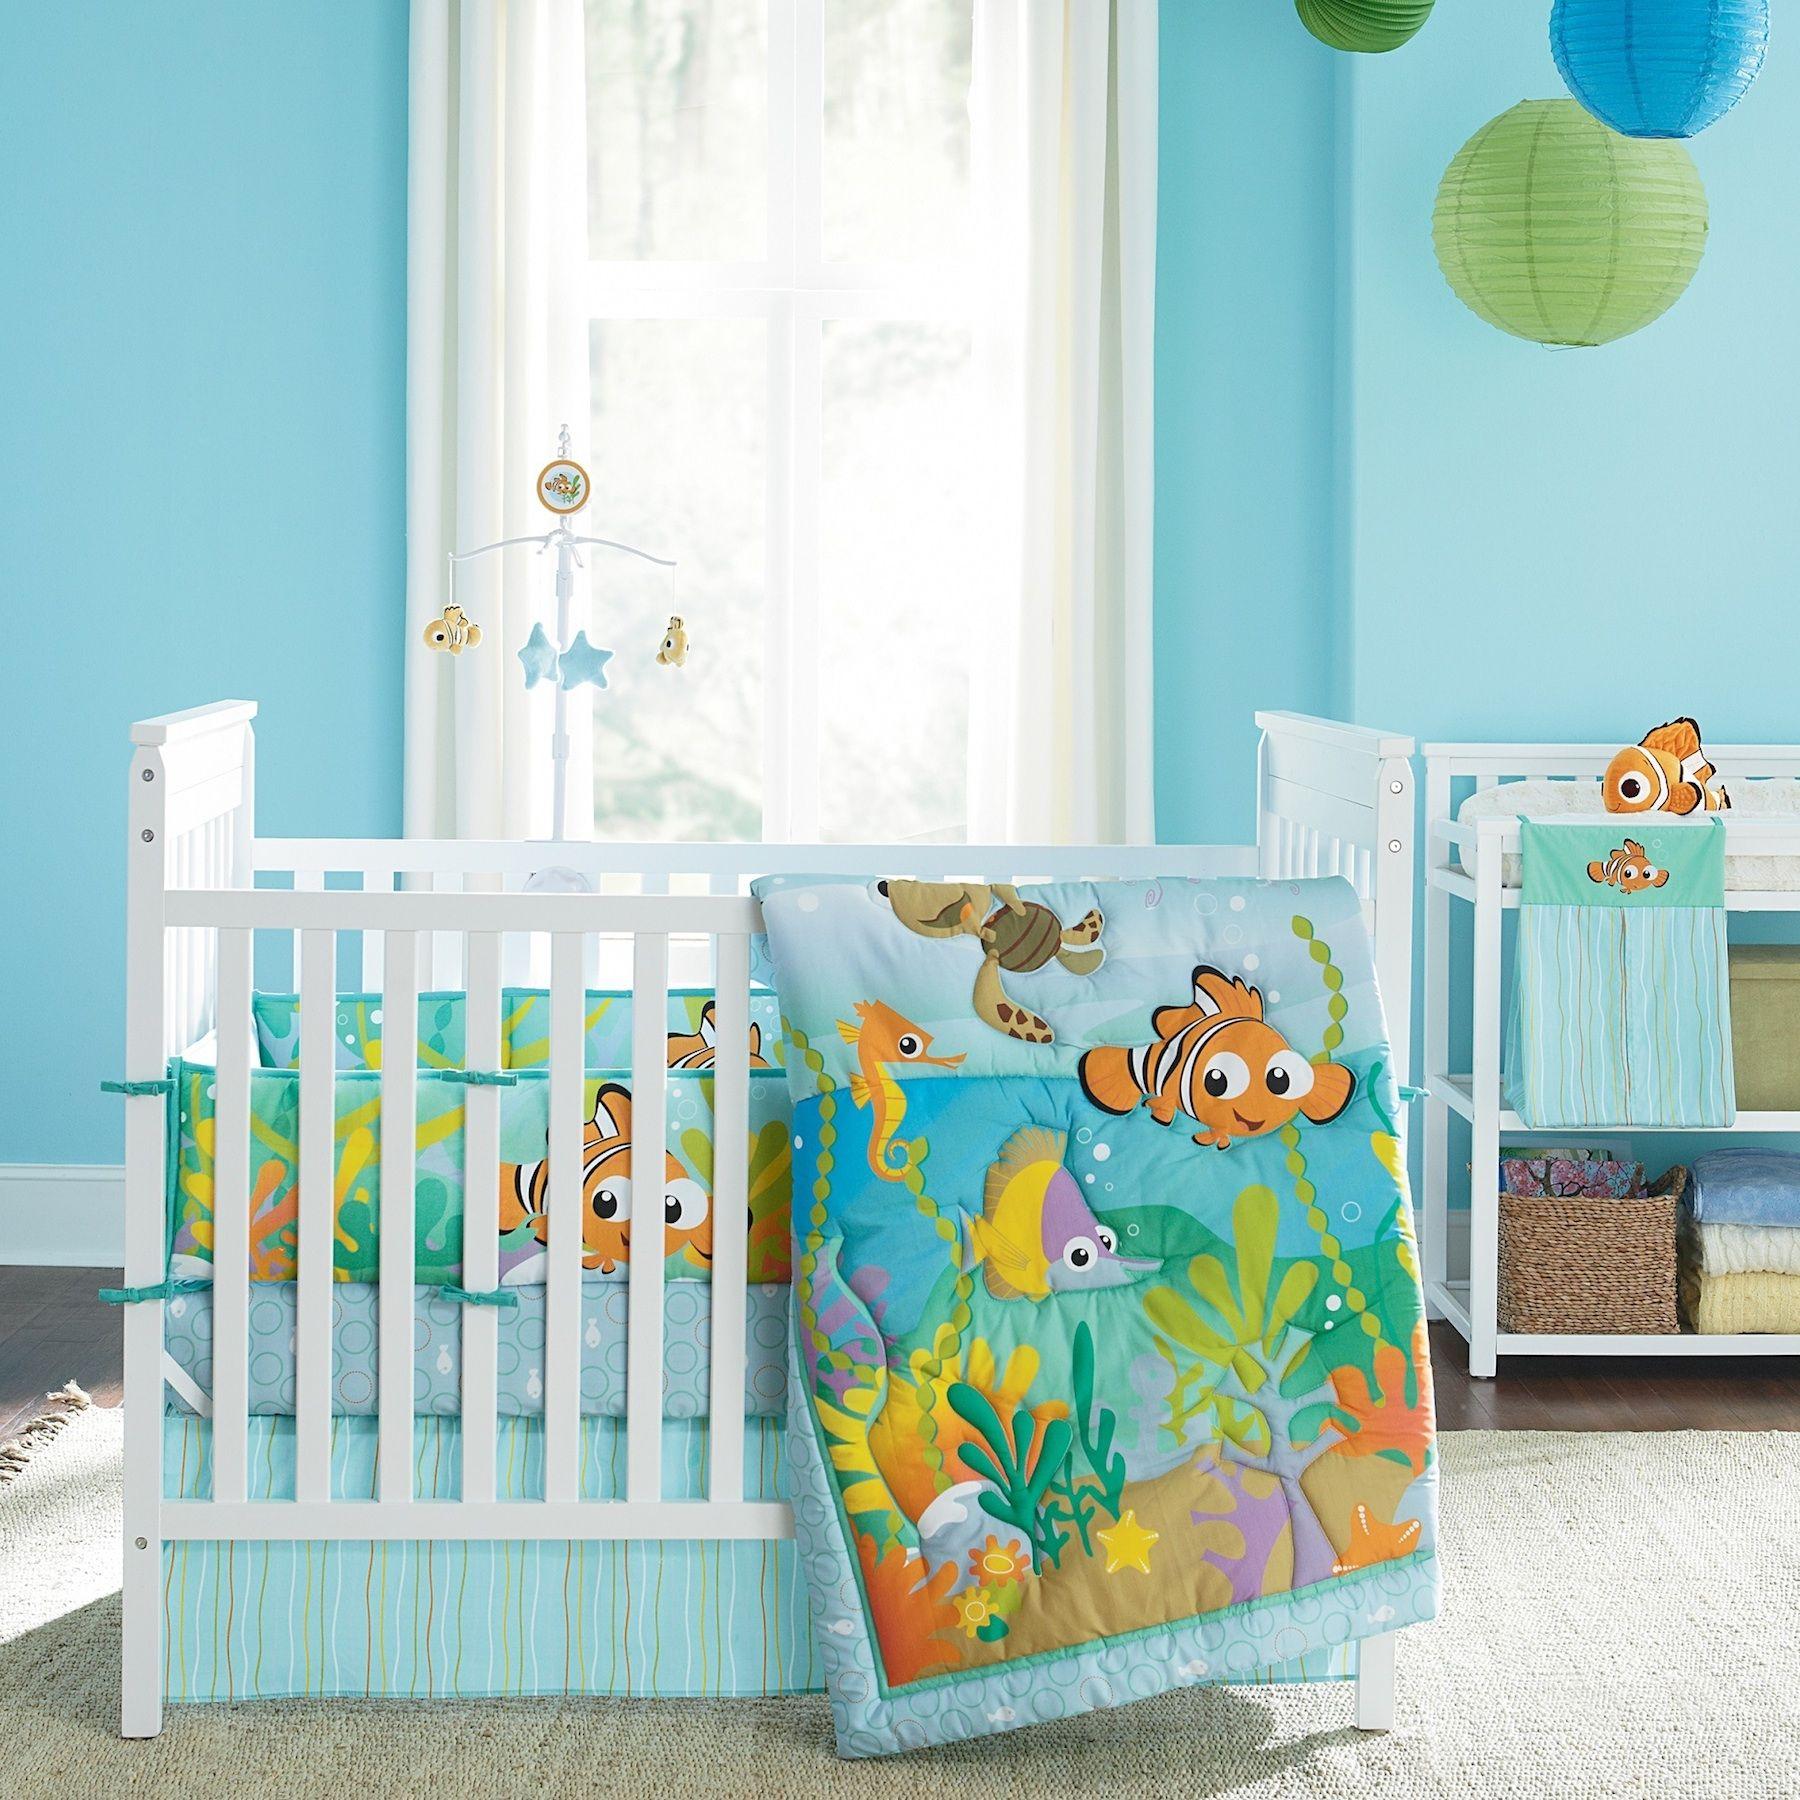 Disney baby finding nemo reef 4 piece crib bedding set